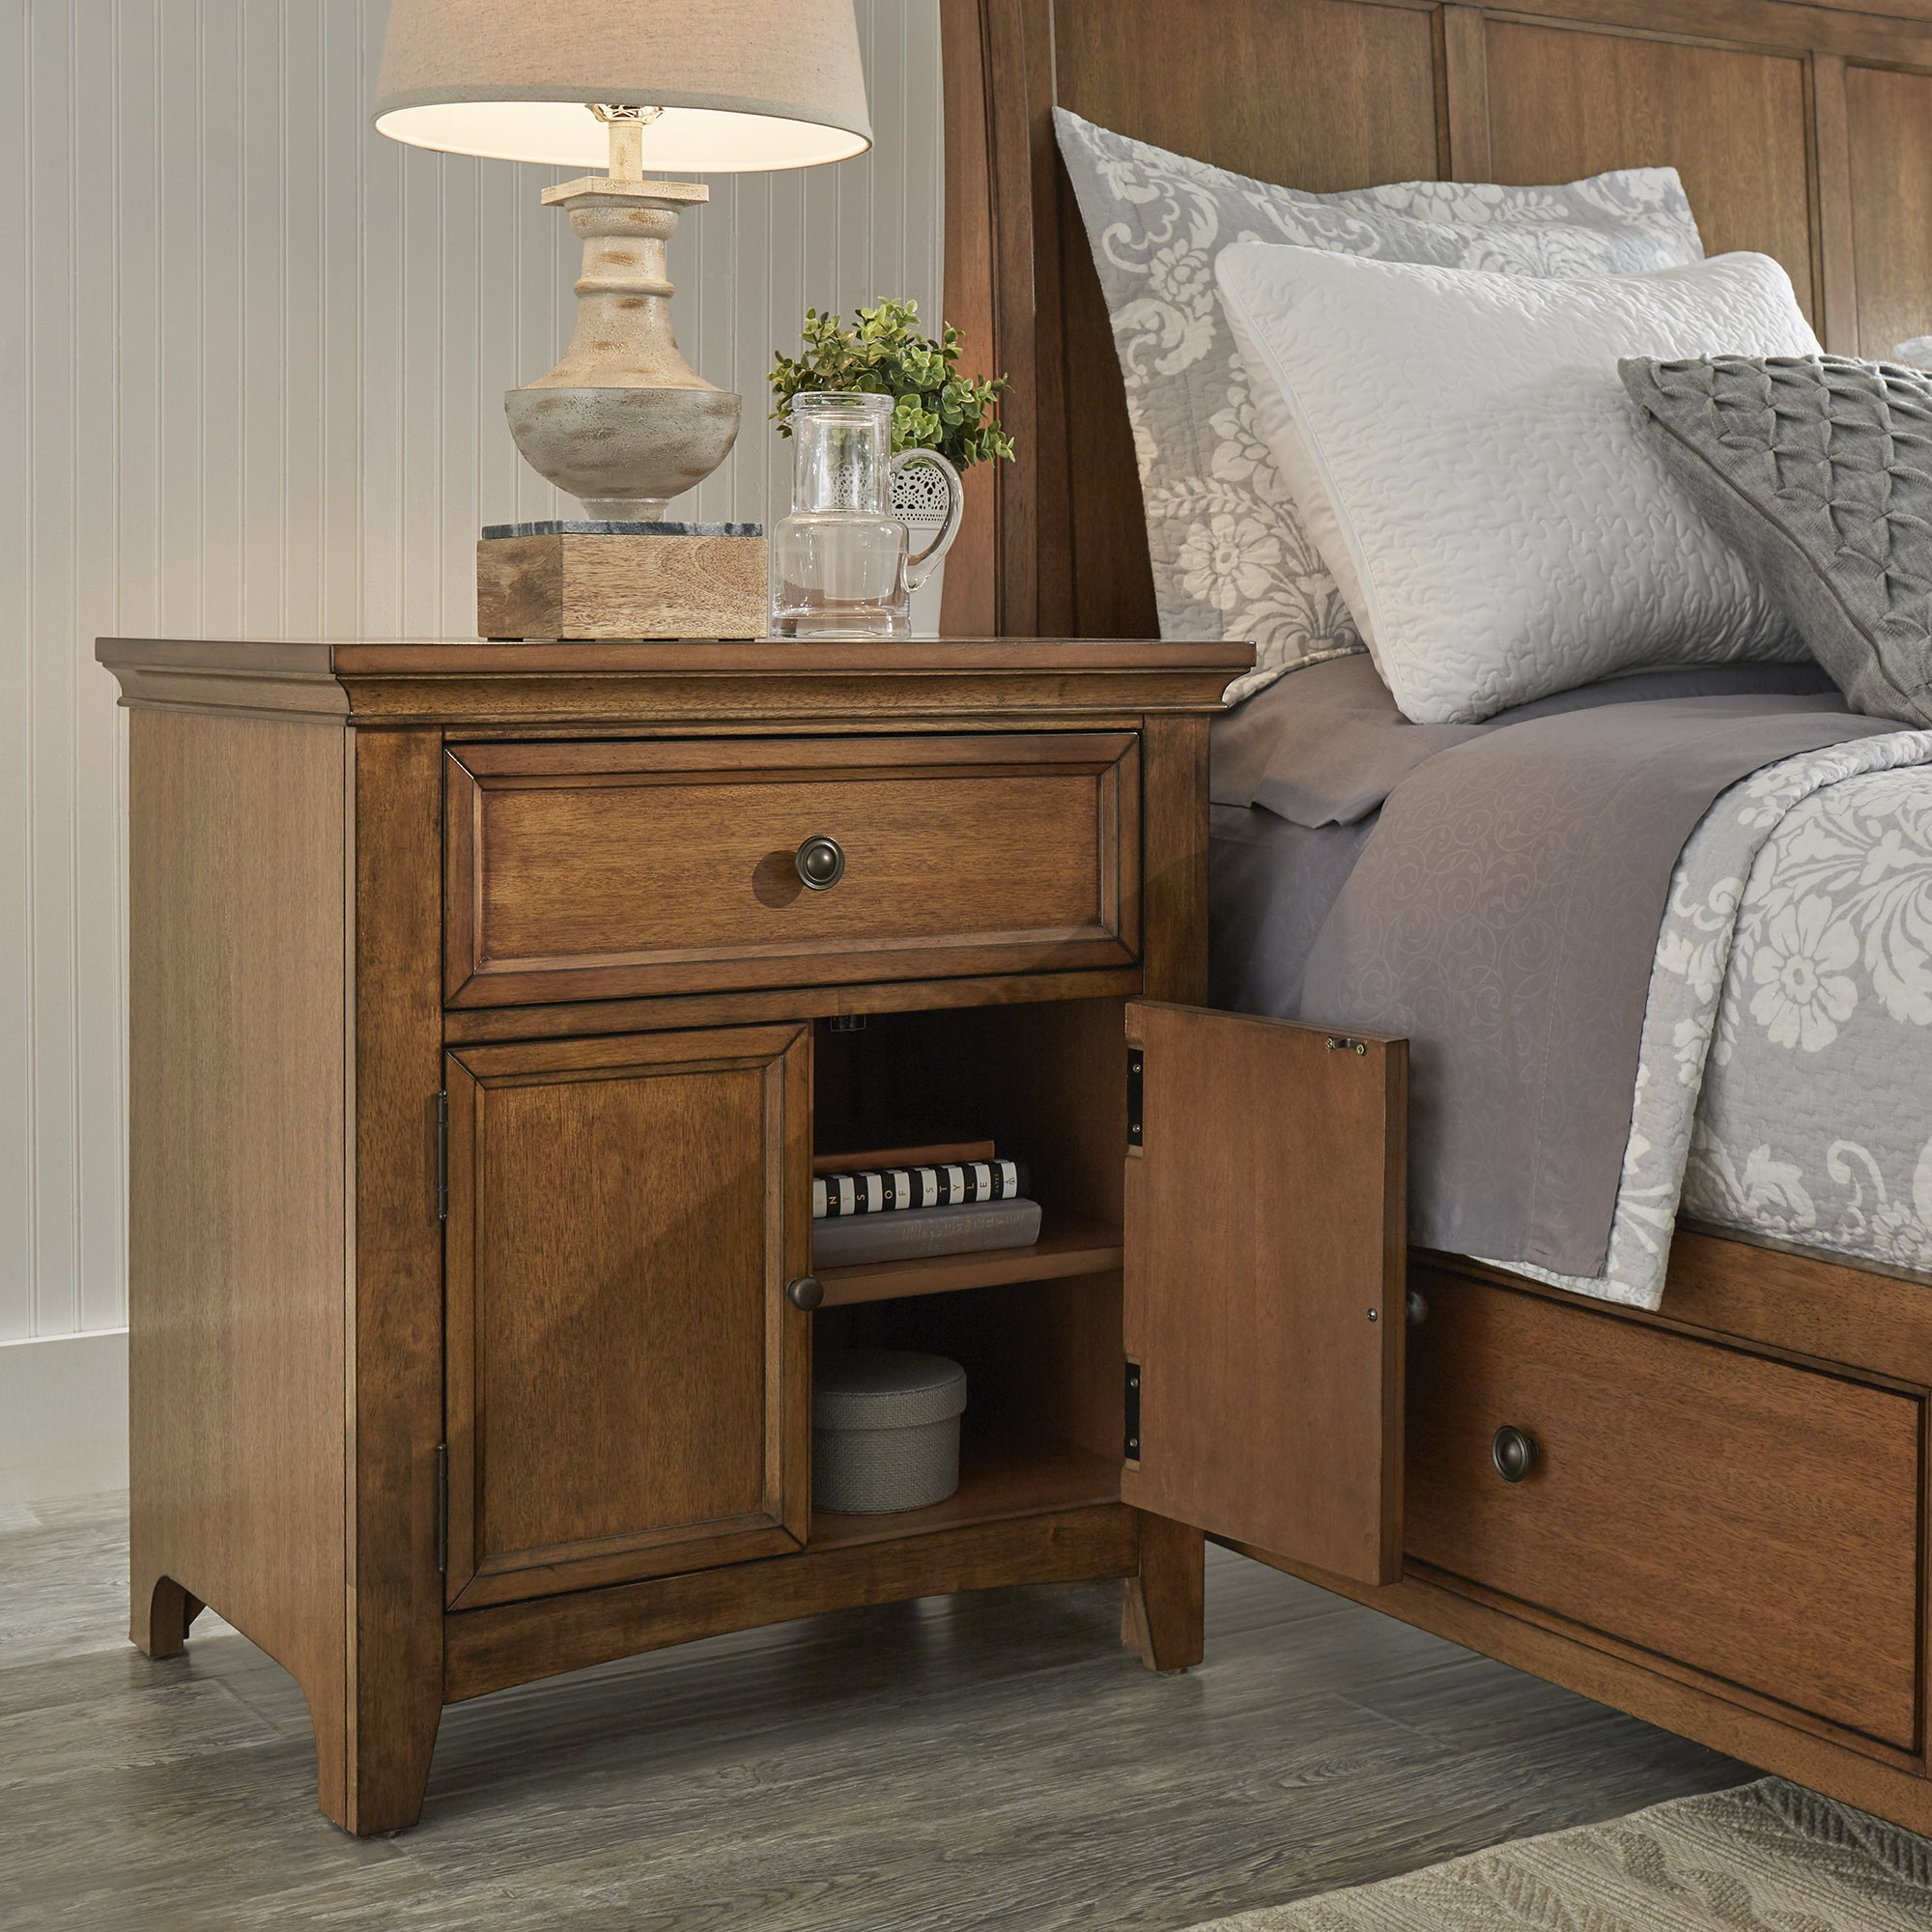 Ediline-1-drawer-Wood-Cupboard-Nightstand-with-Charging-